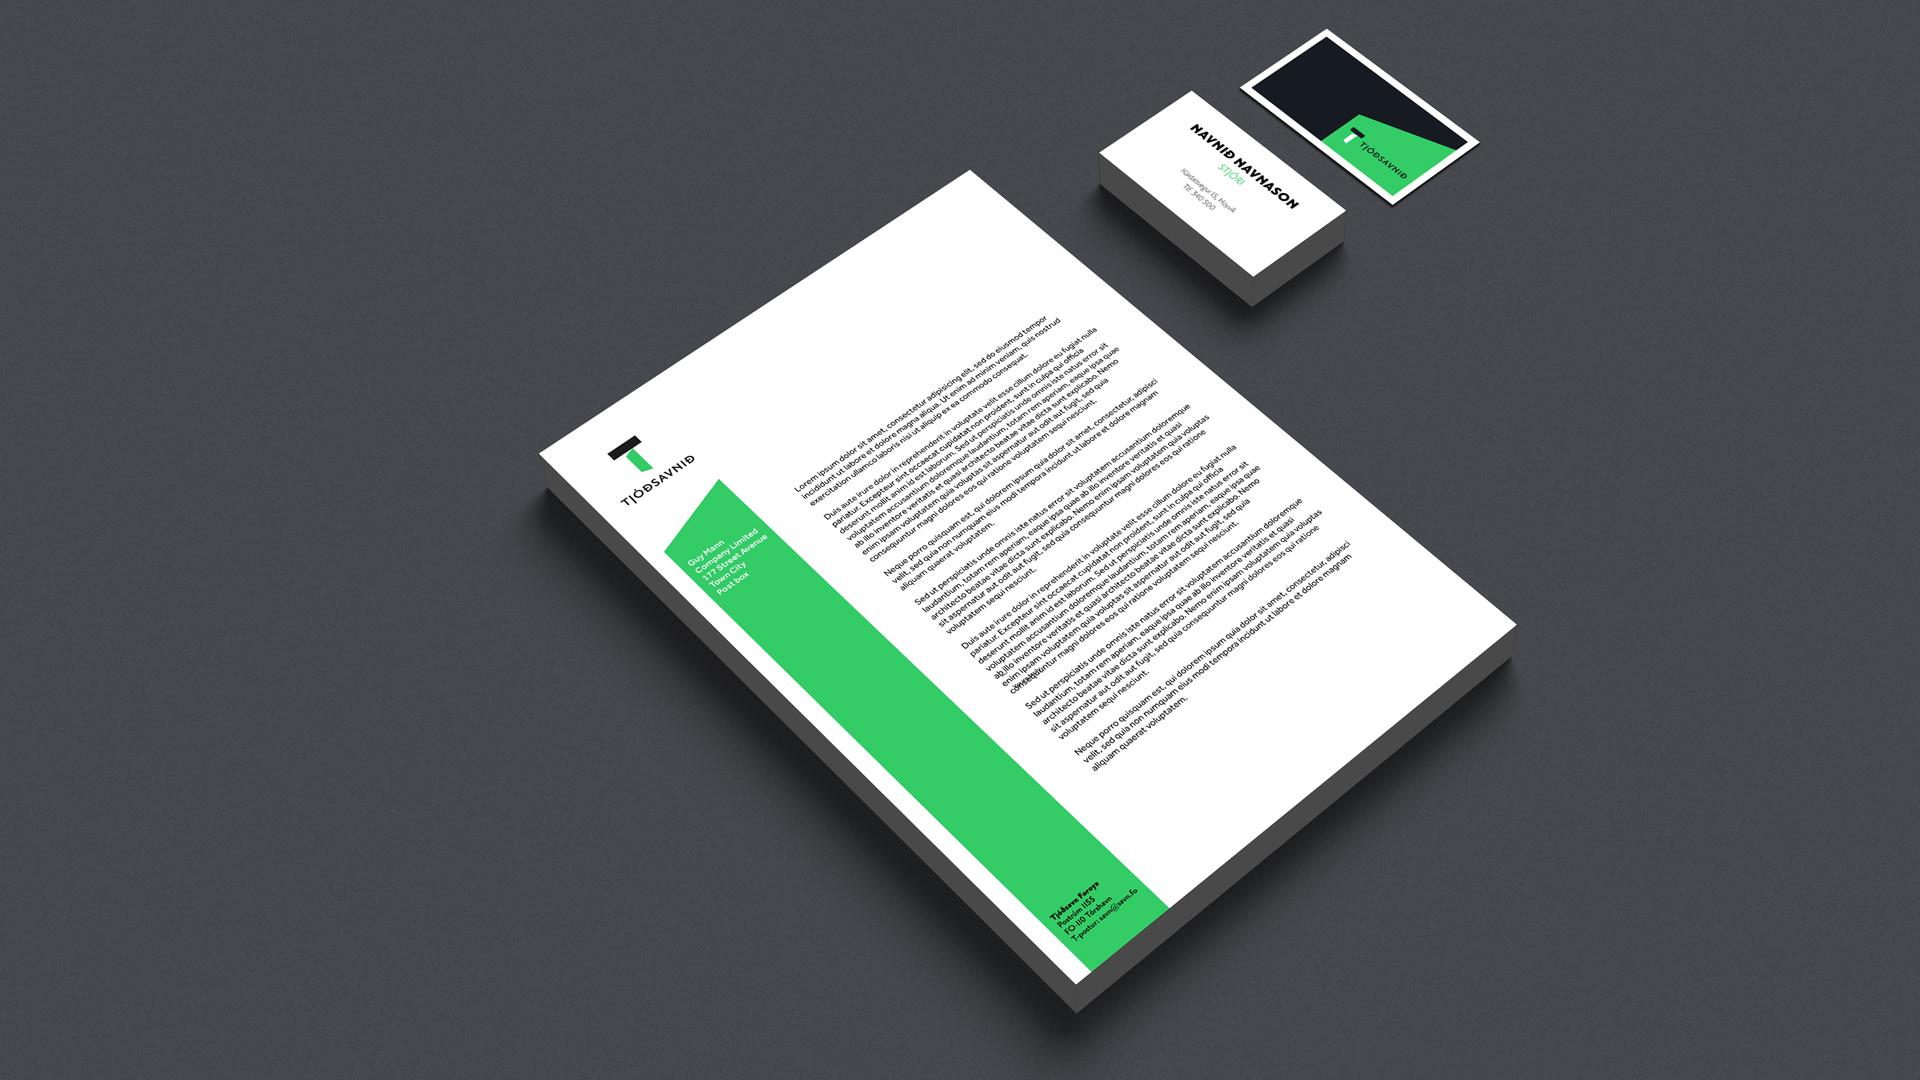 TS_Stationery_Slide.jpg